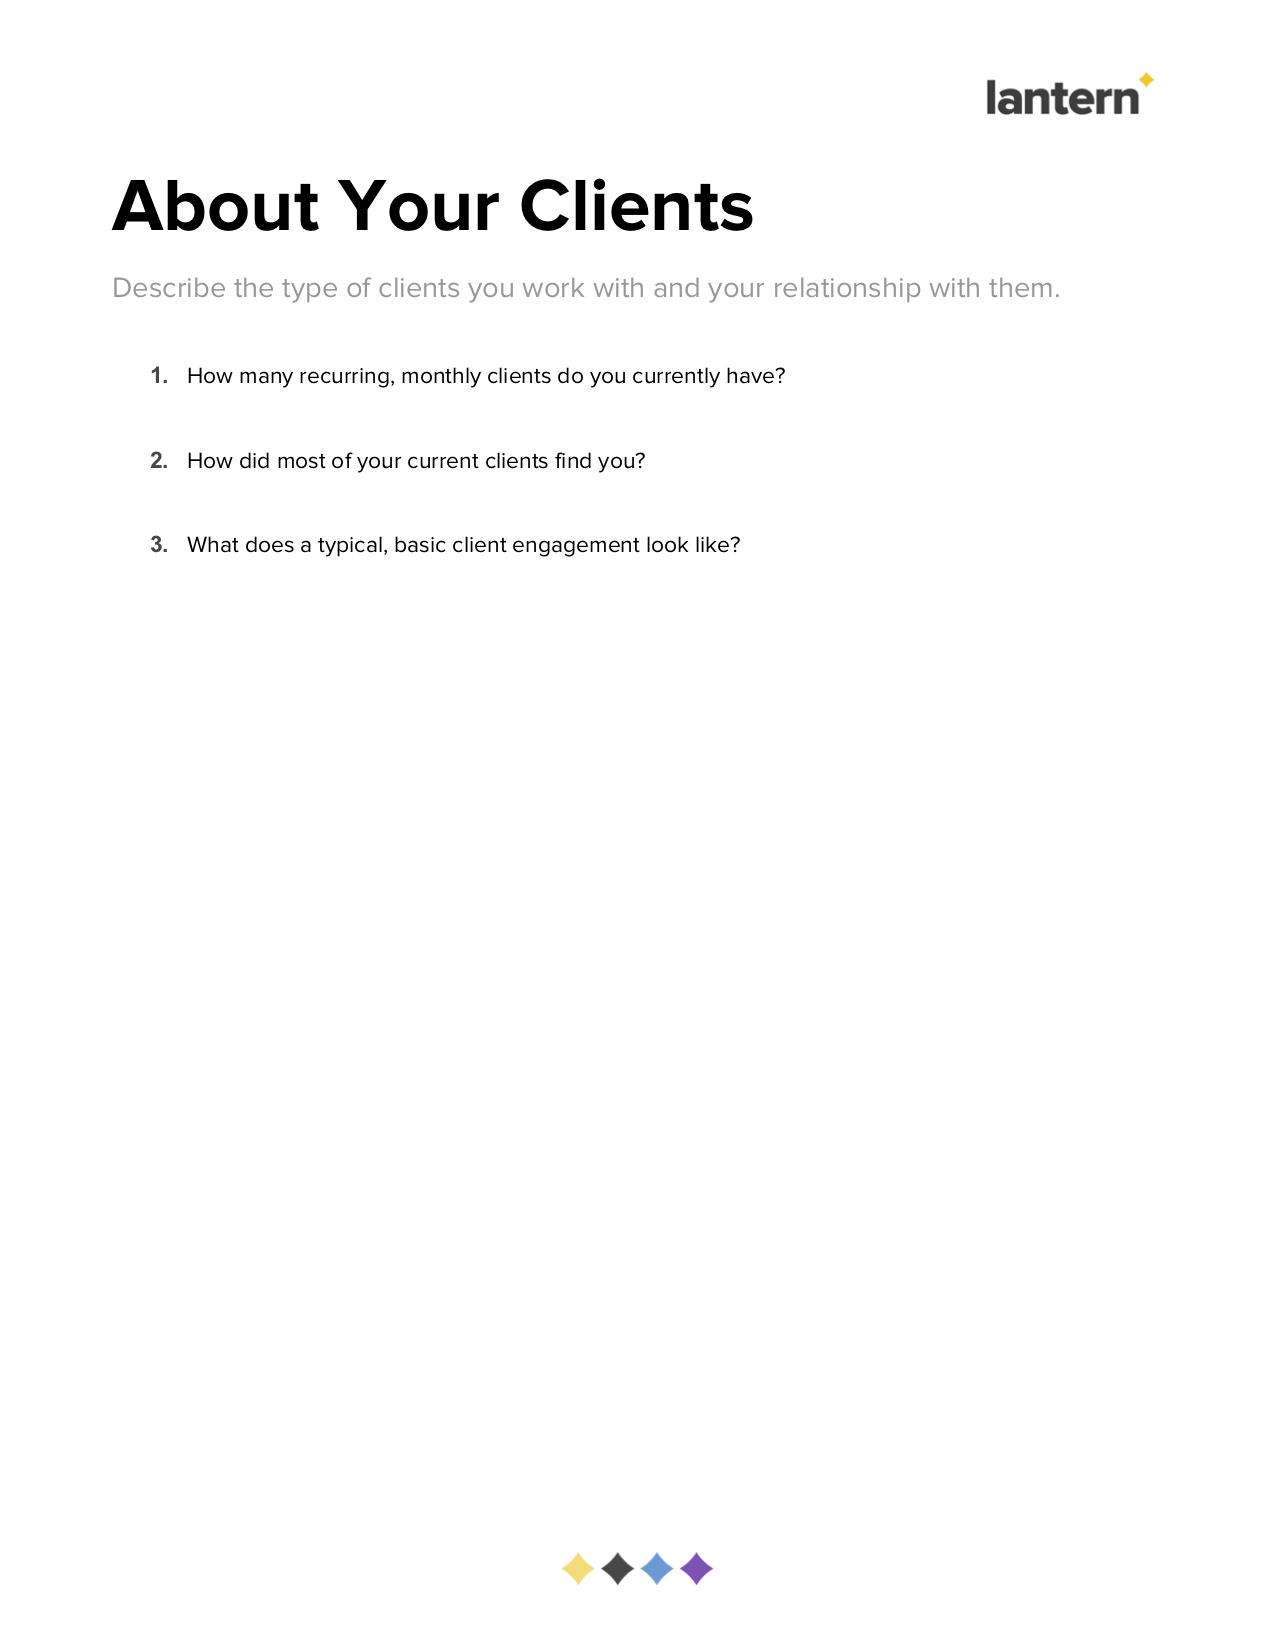 Marketing Roadmap Kickoff Questions_3.png